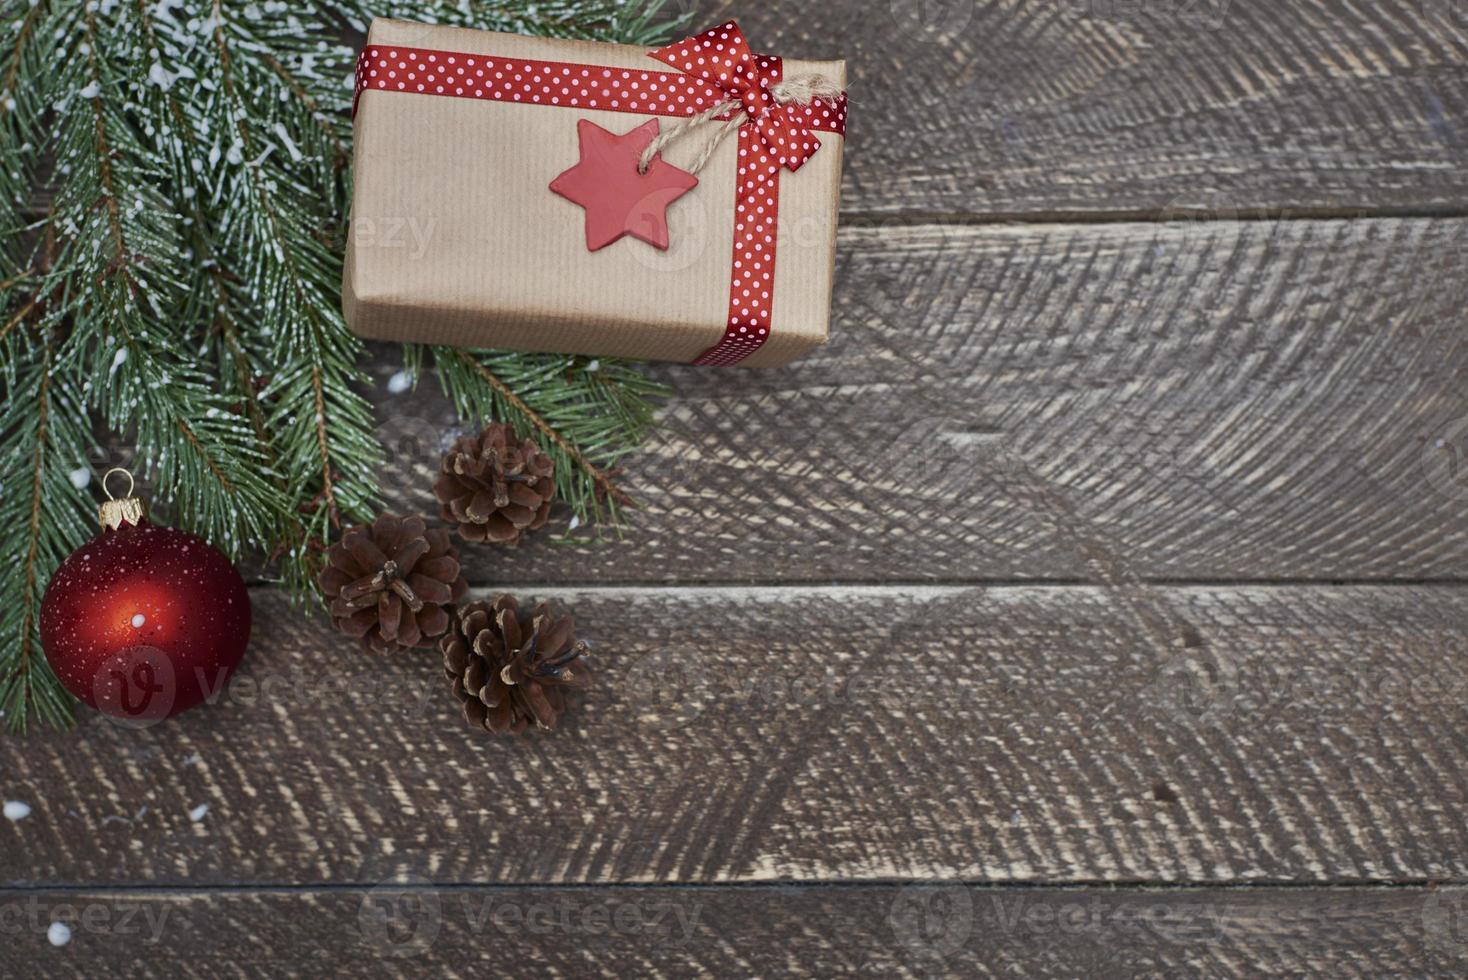 Christmas gift in winter season photo